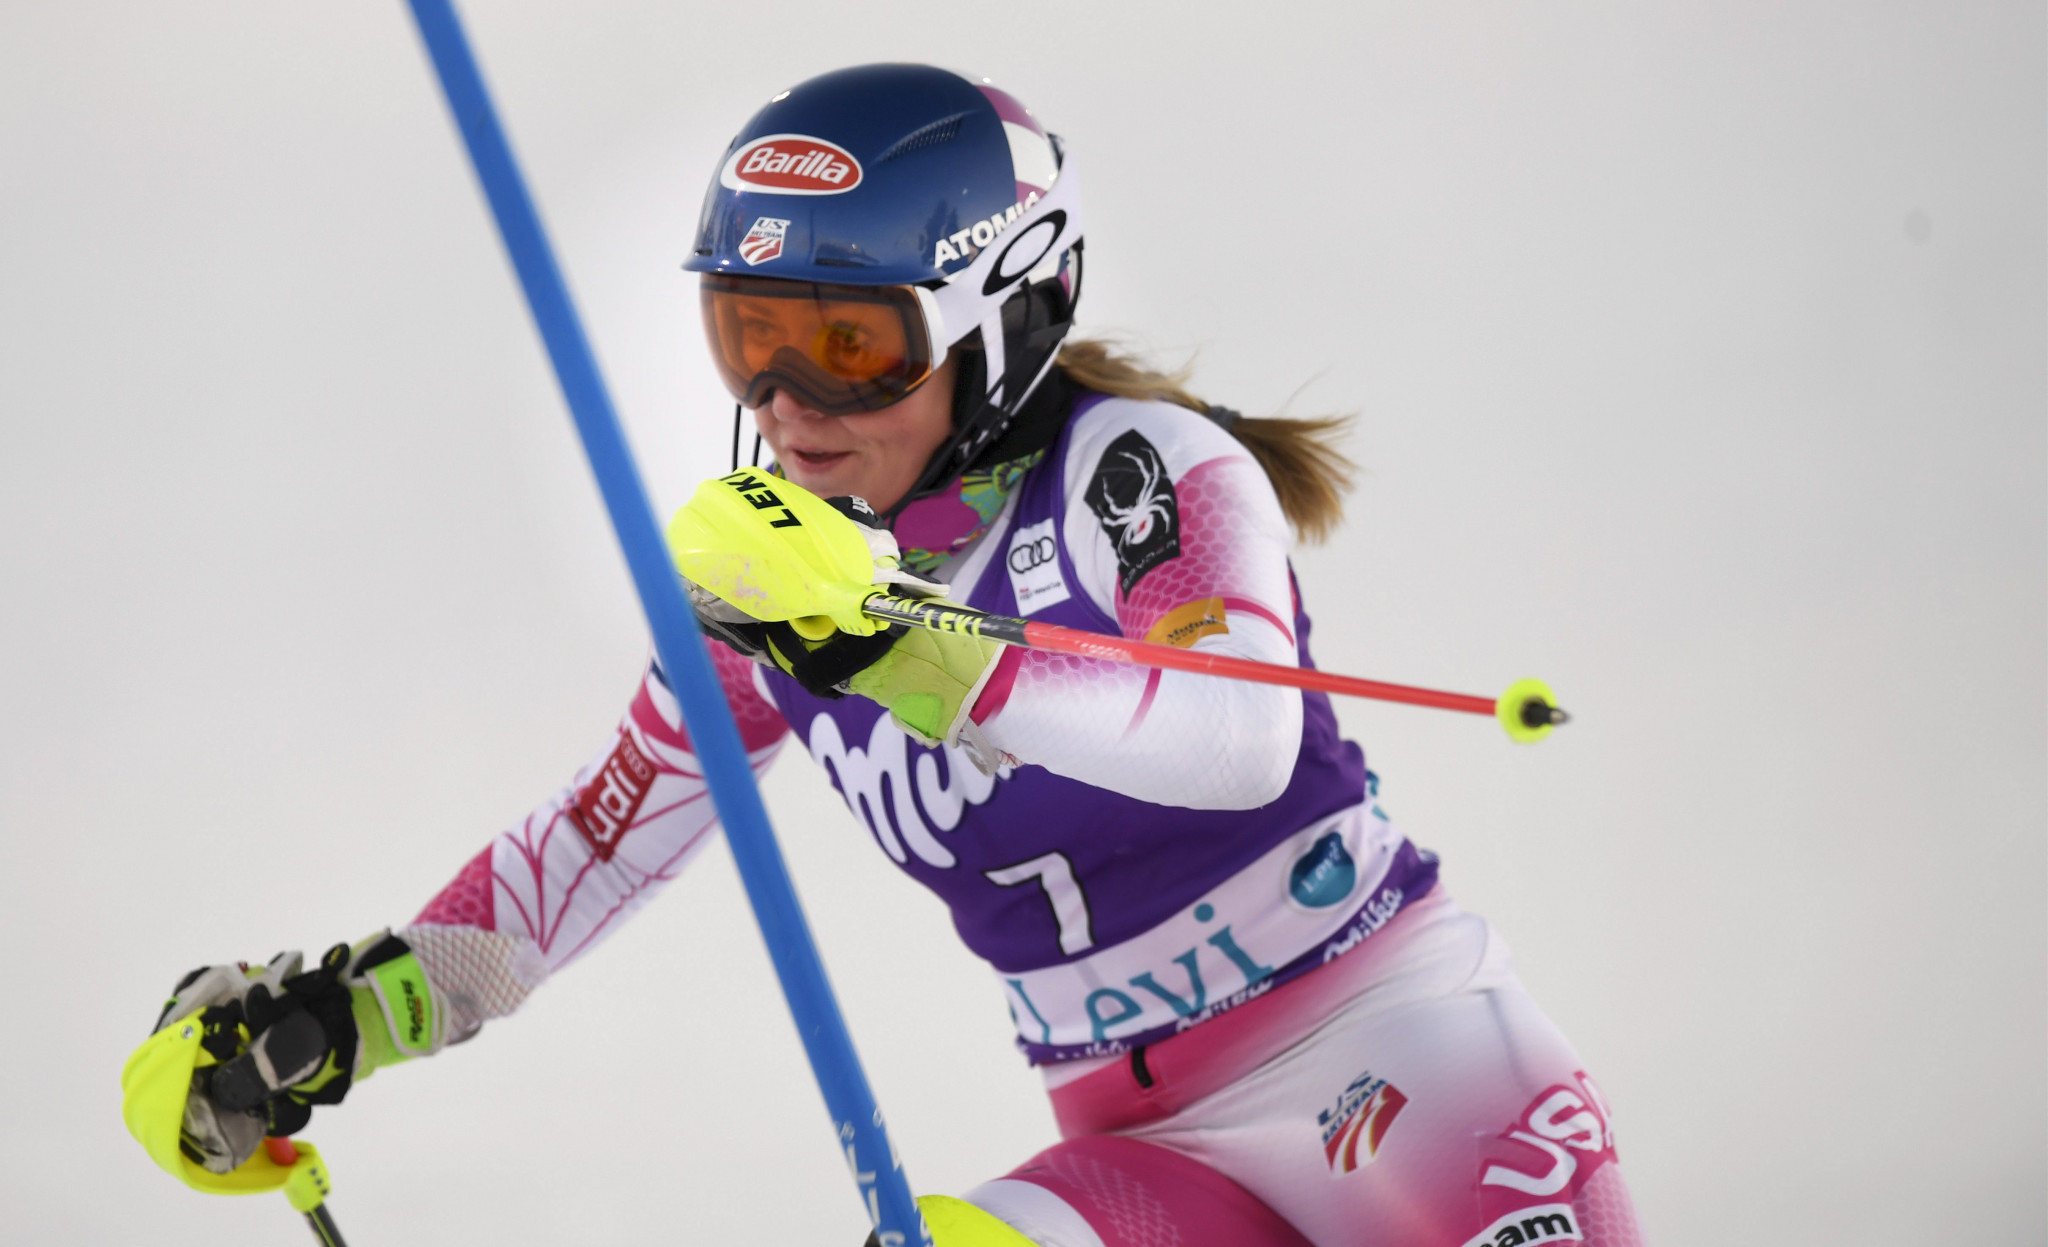 Slalom skiers prepare for FIS Alpine World Cup in Levi